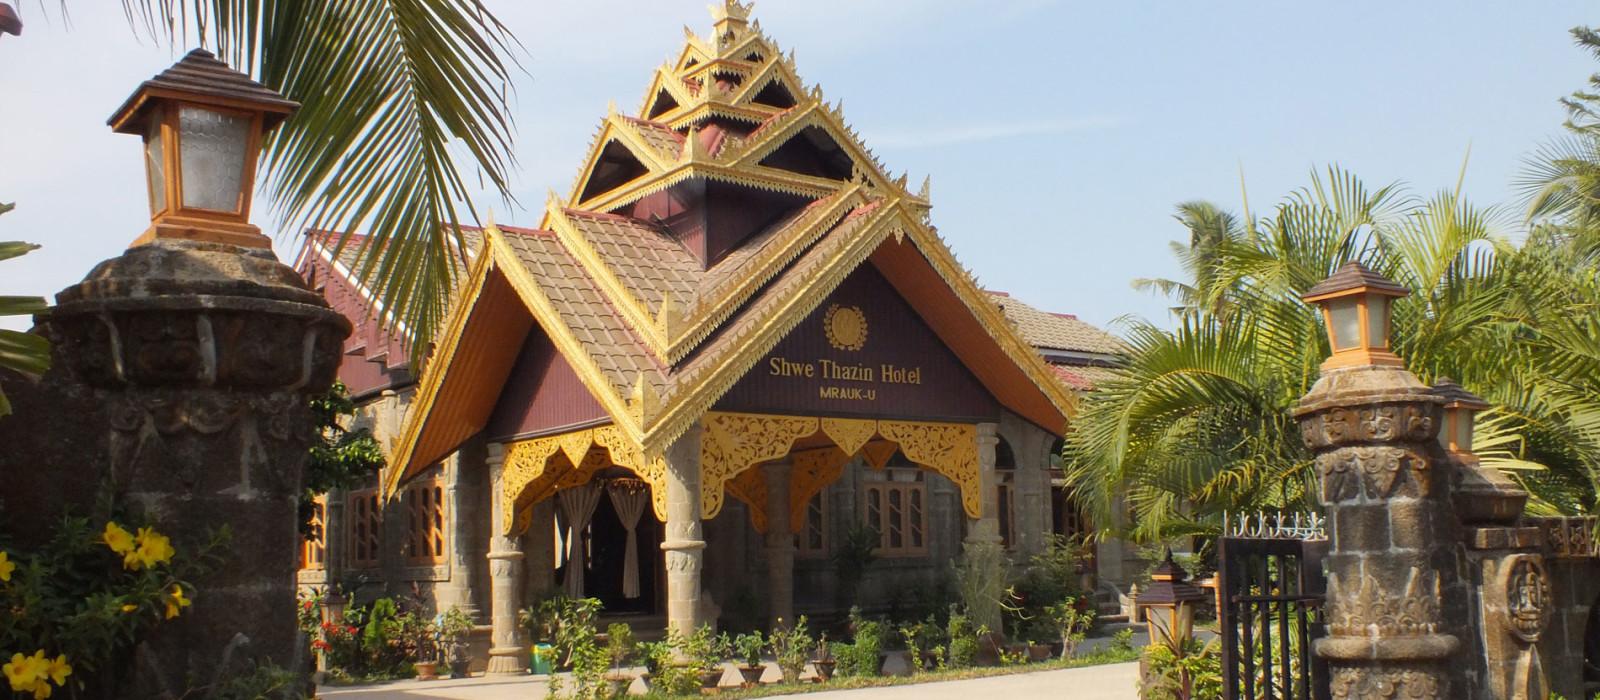 Hotel Shwe Thazin  Mrauk U Myanmar